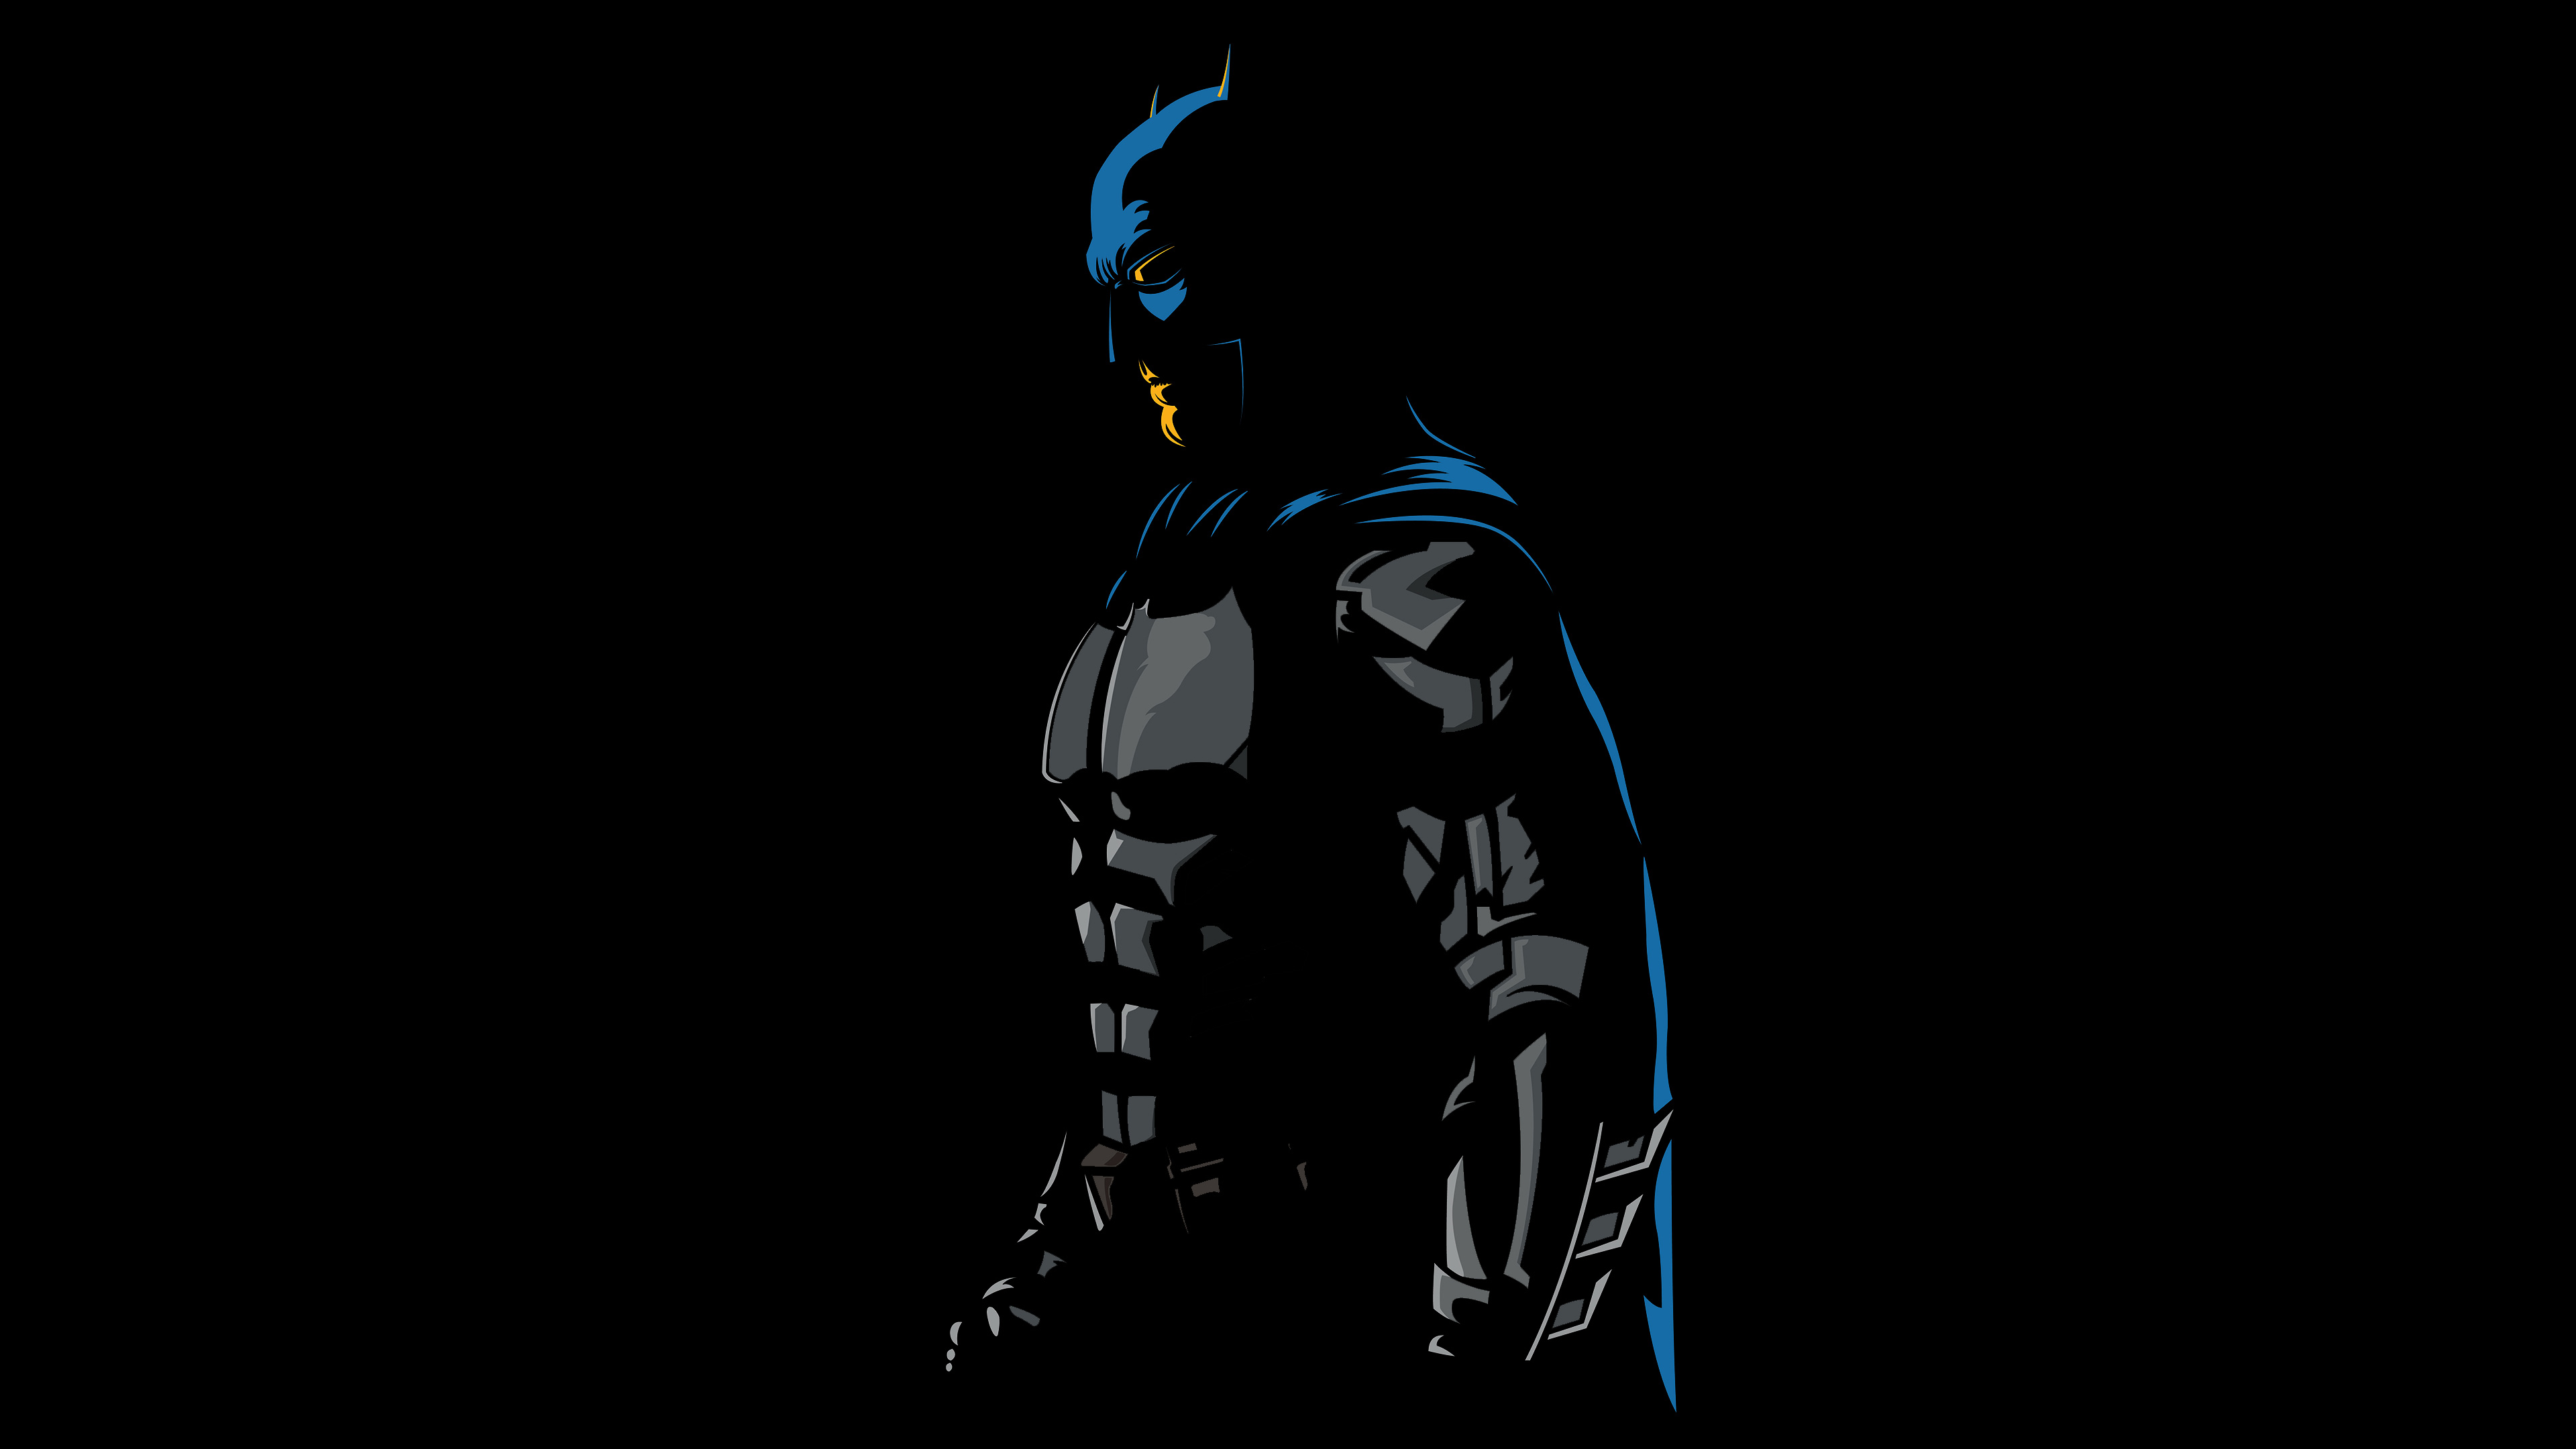 Batman 4k Minimalism Artwork Hd Superheroes 4k Wallpapers